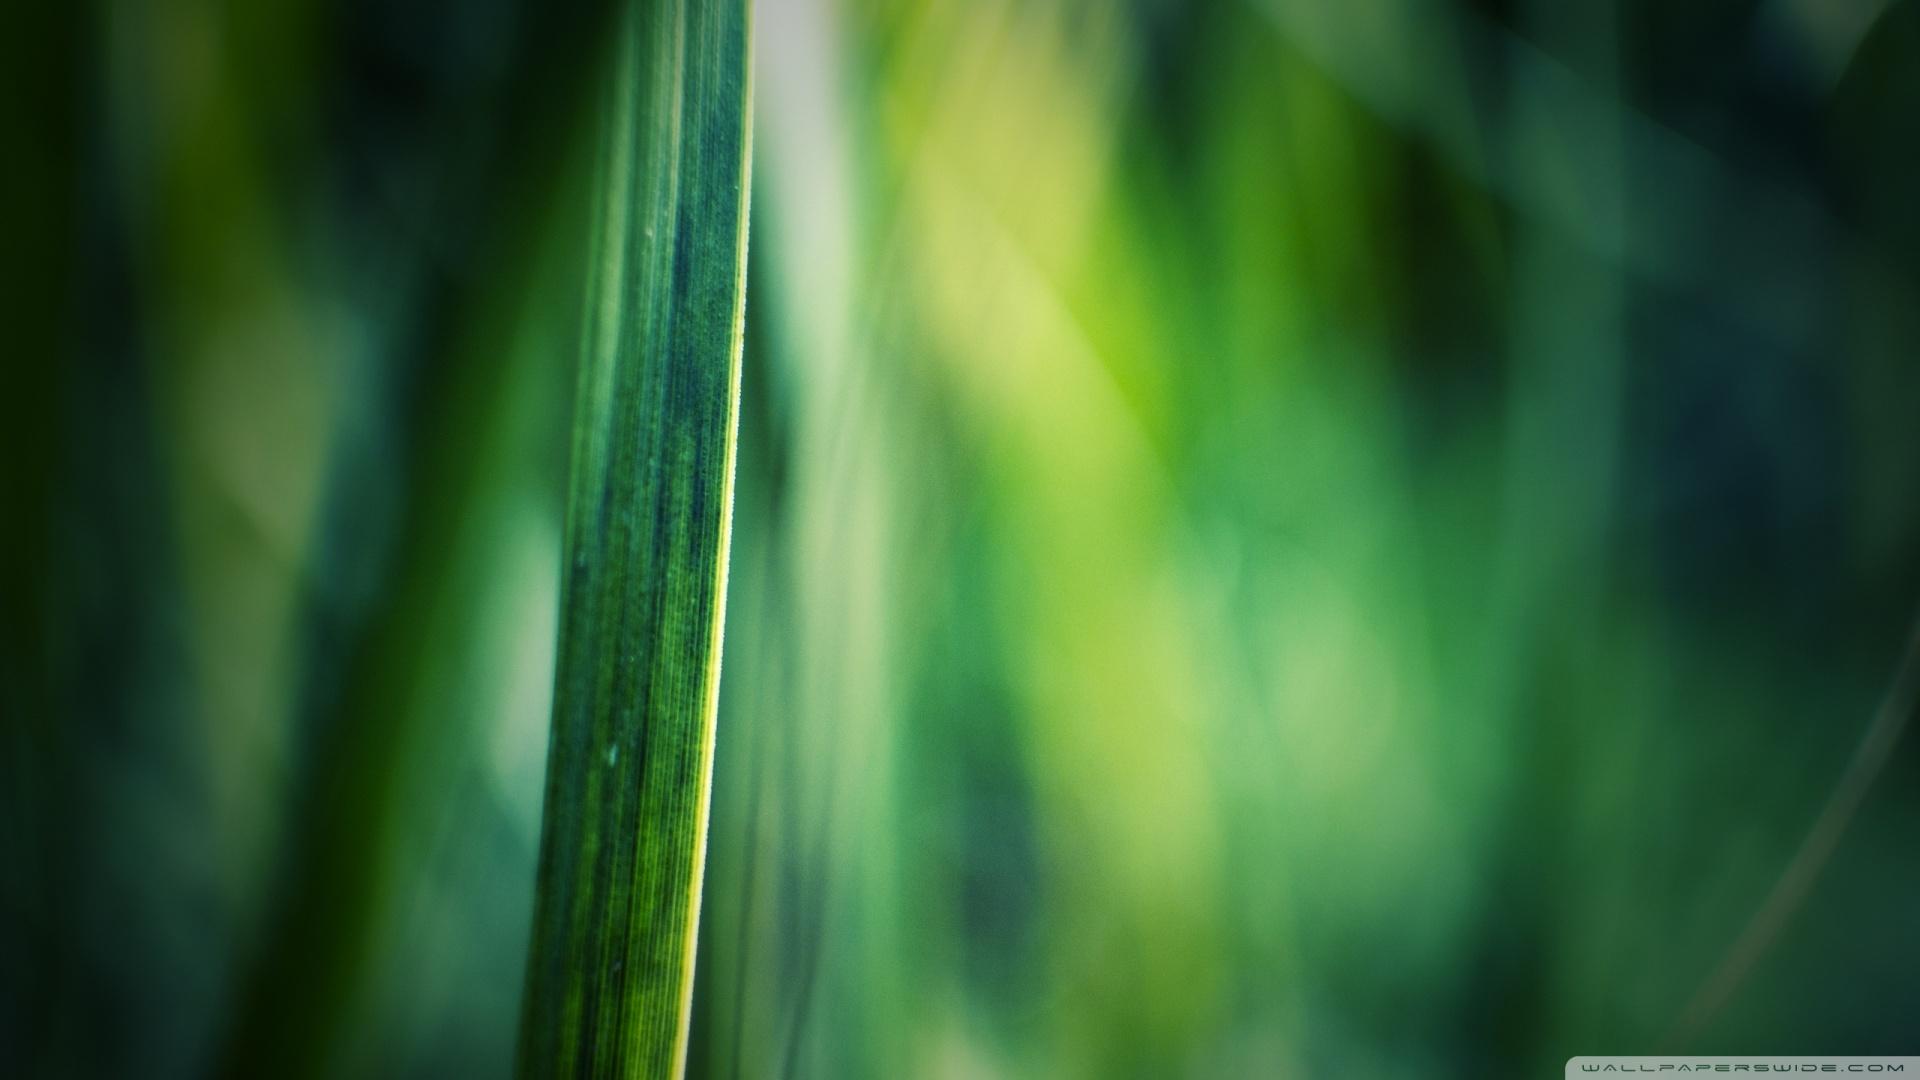 Grass Bokeh Wallpapers